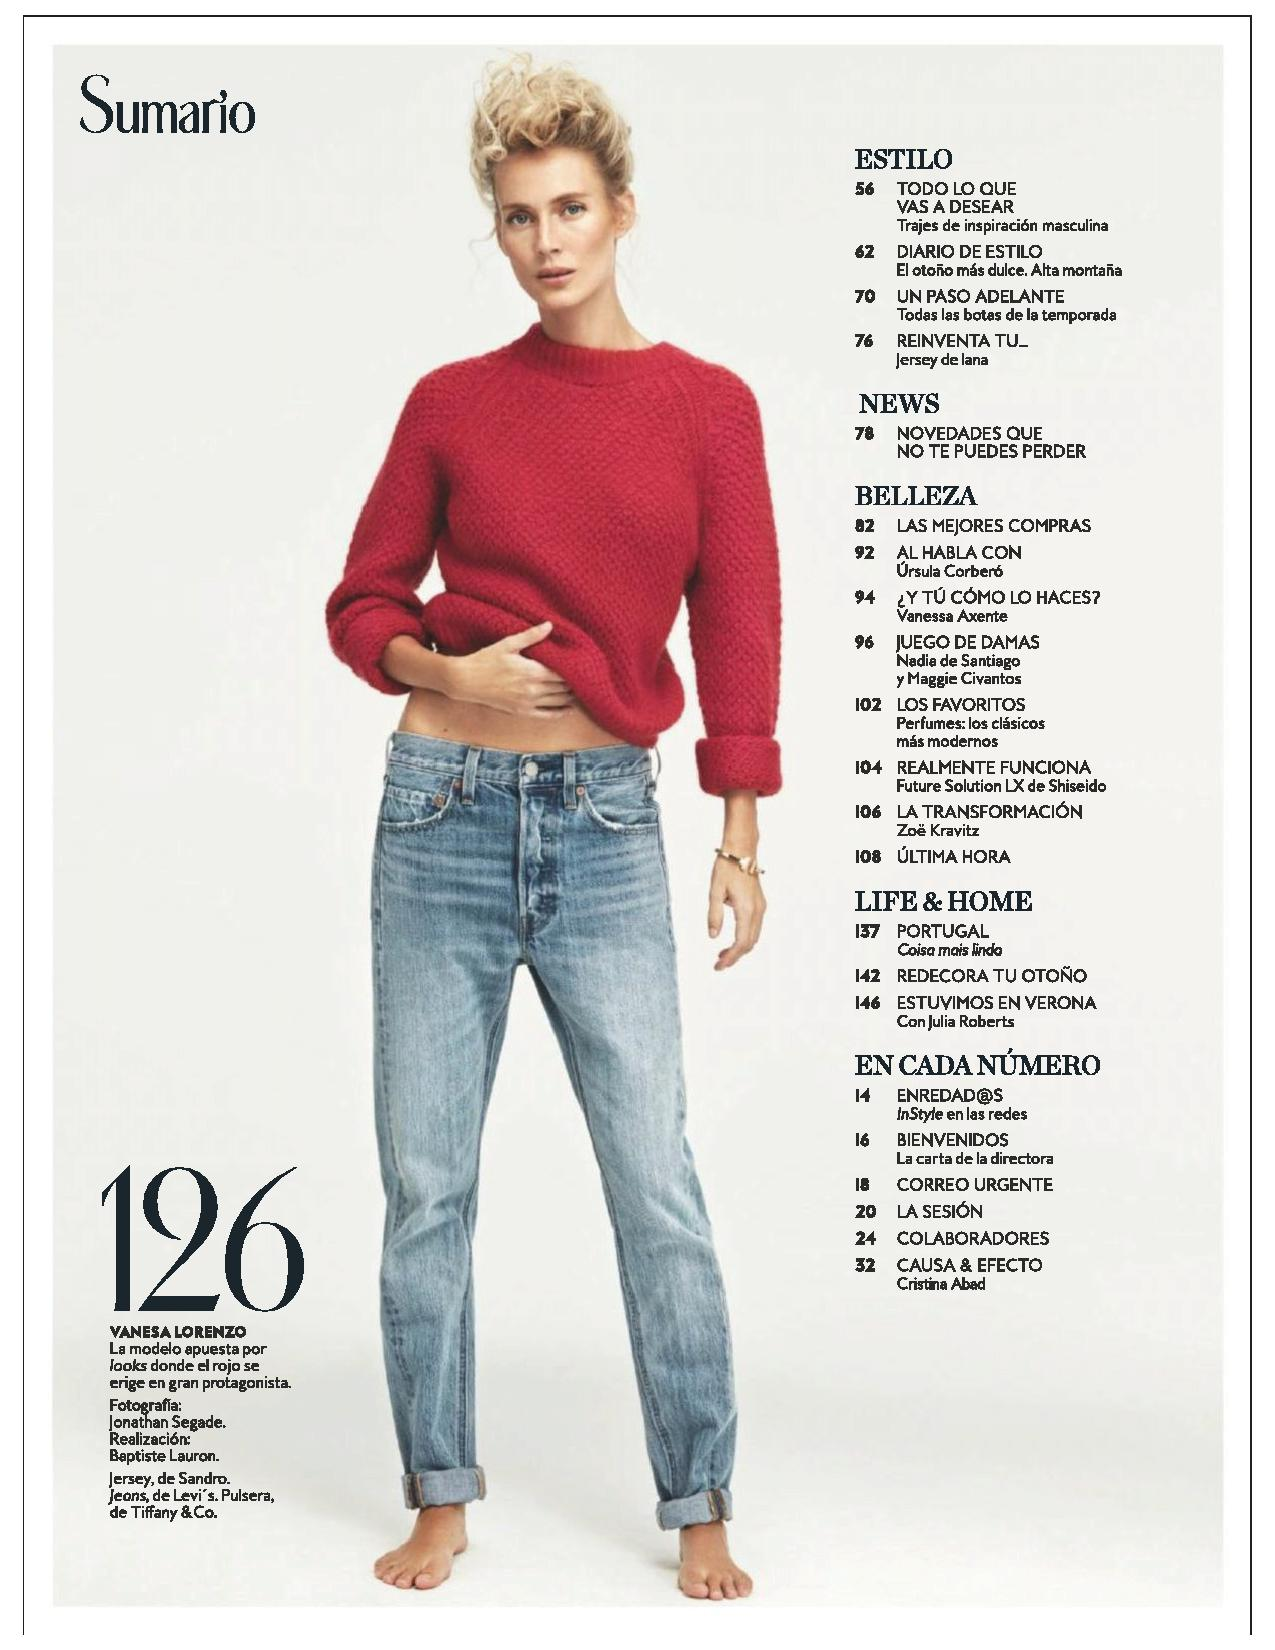 91fd54f2890 Vanessa Lorenzo - Page 24 - Female Fashion Models - Bellazon